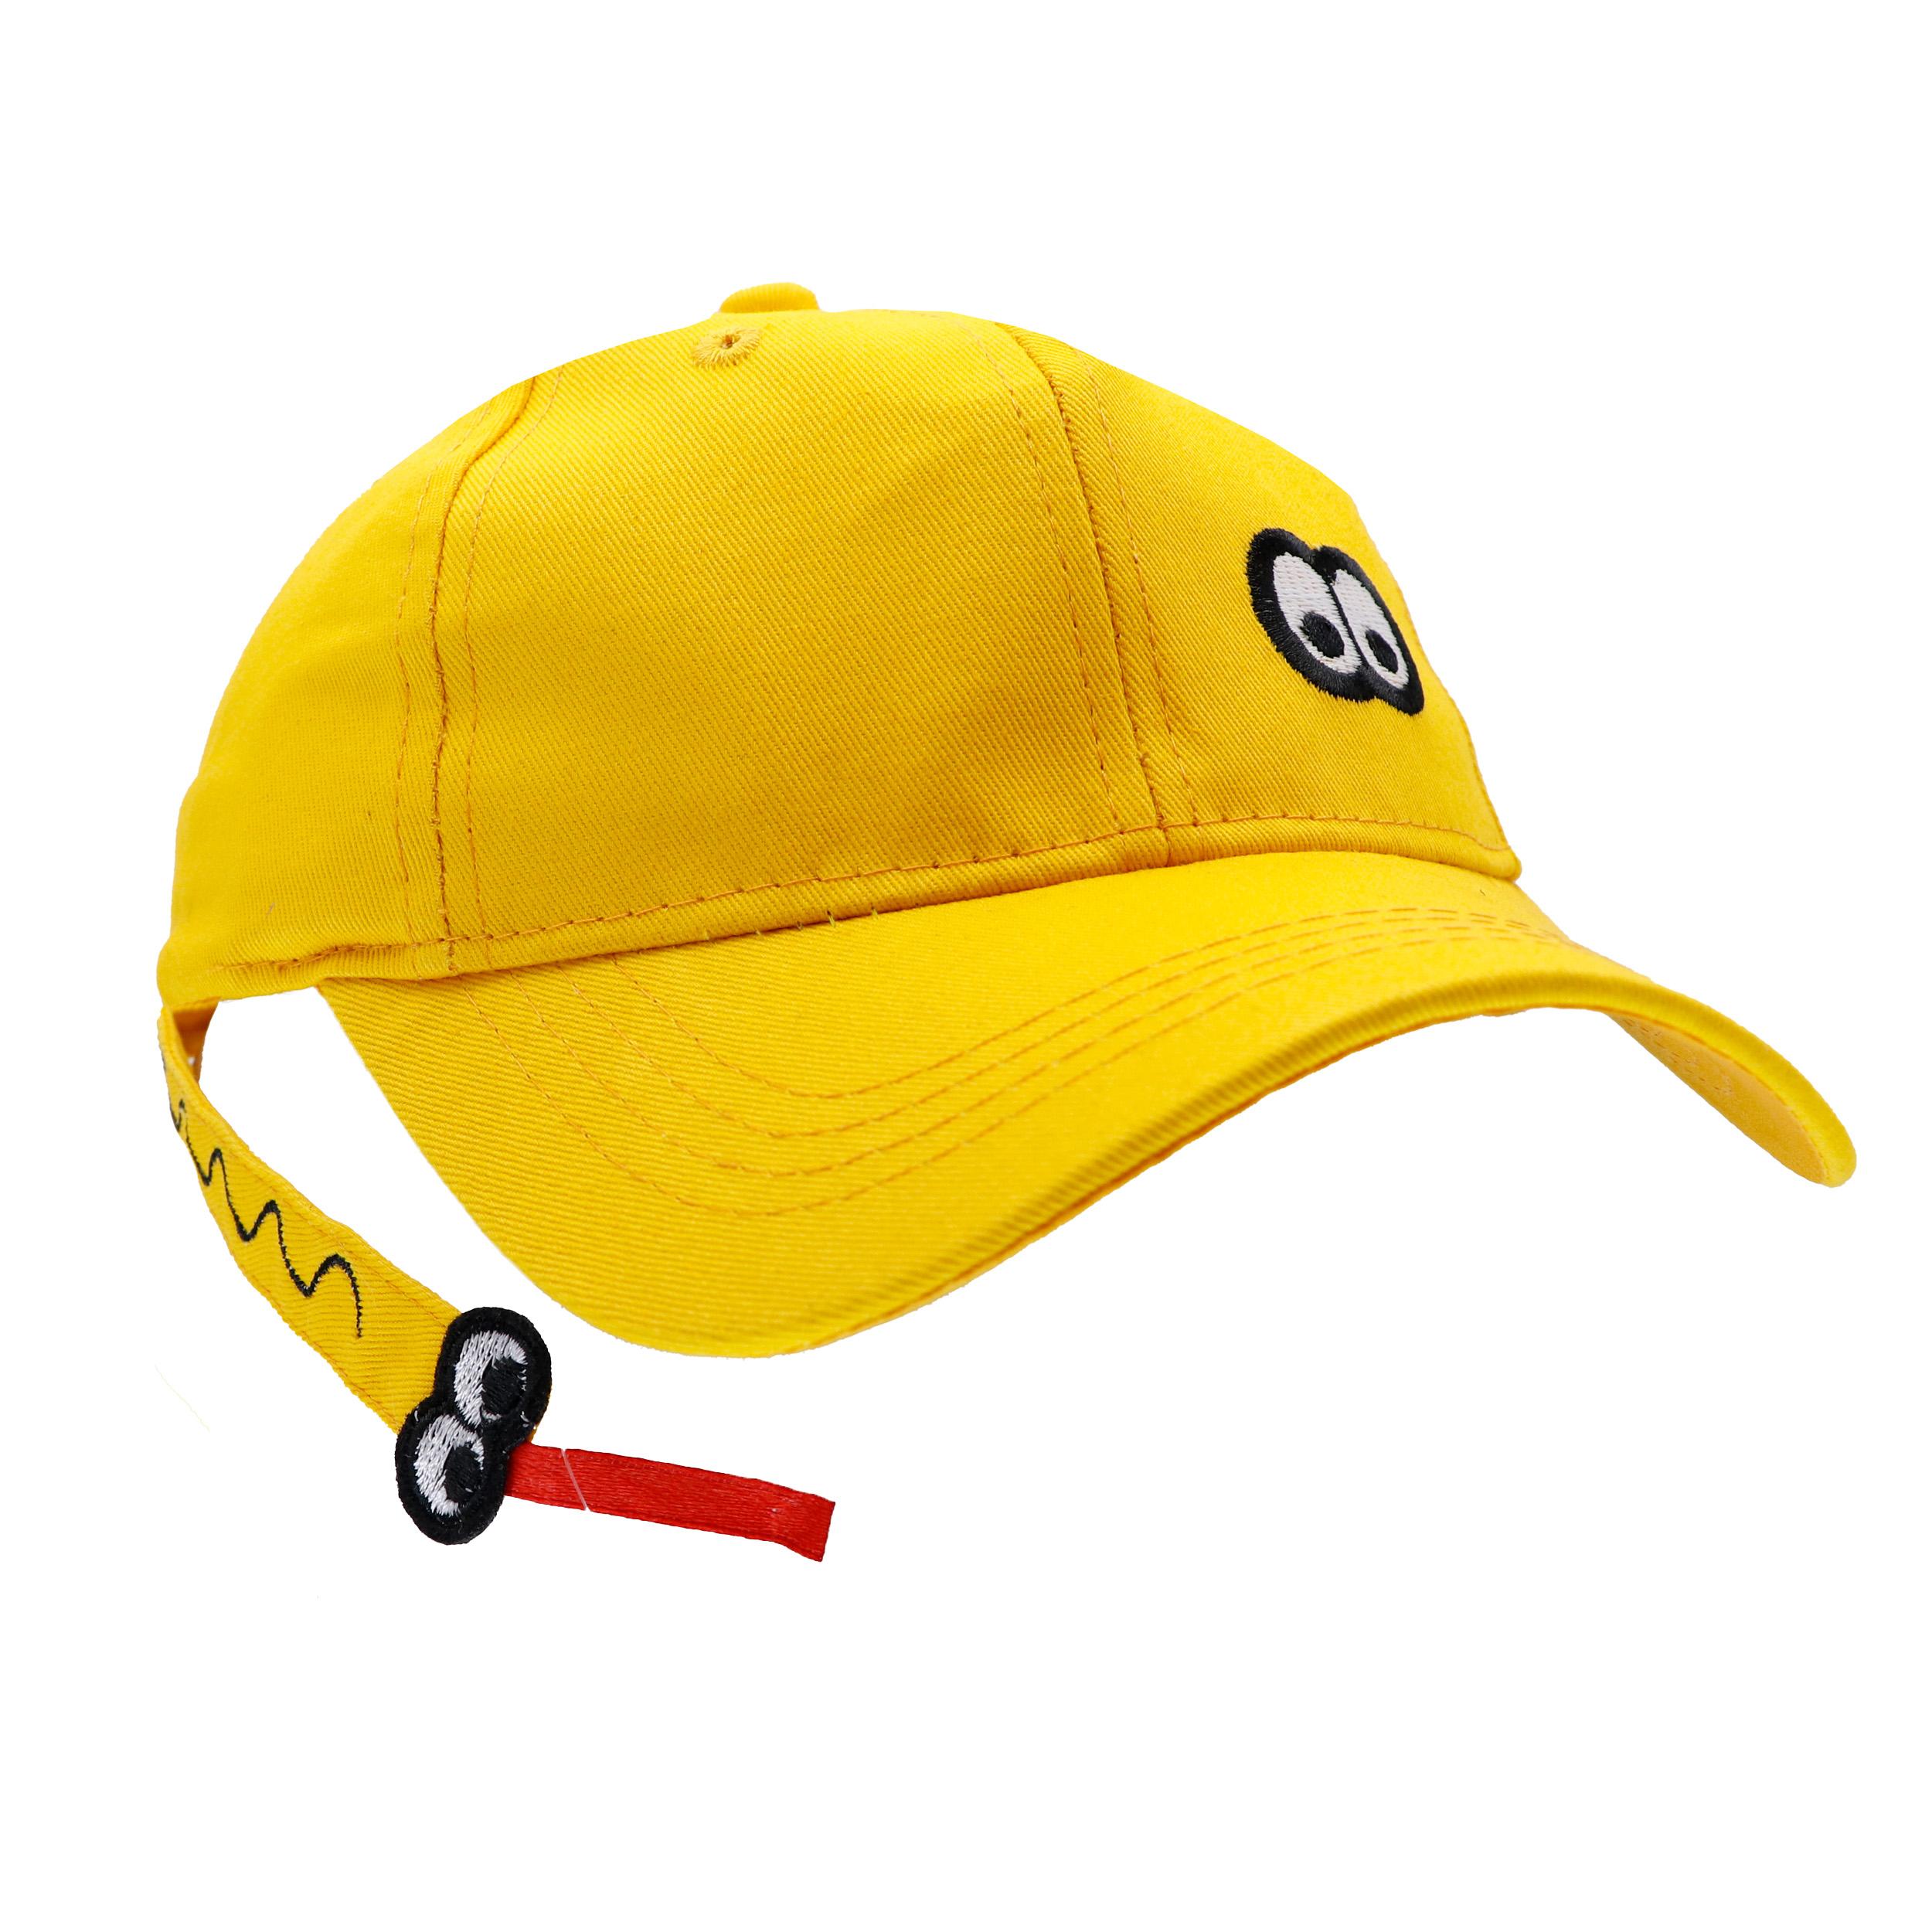 کلاه کپ بچگانه طرح LIN-CHESH رنگ زرد